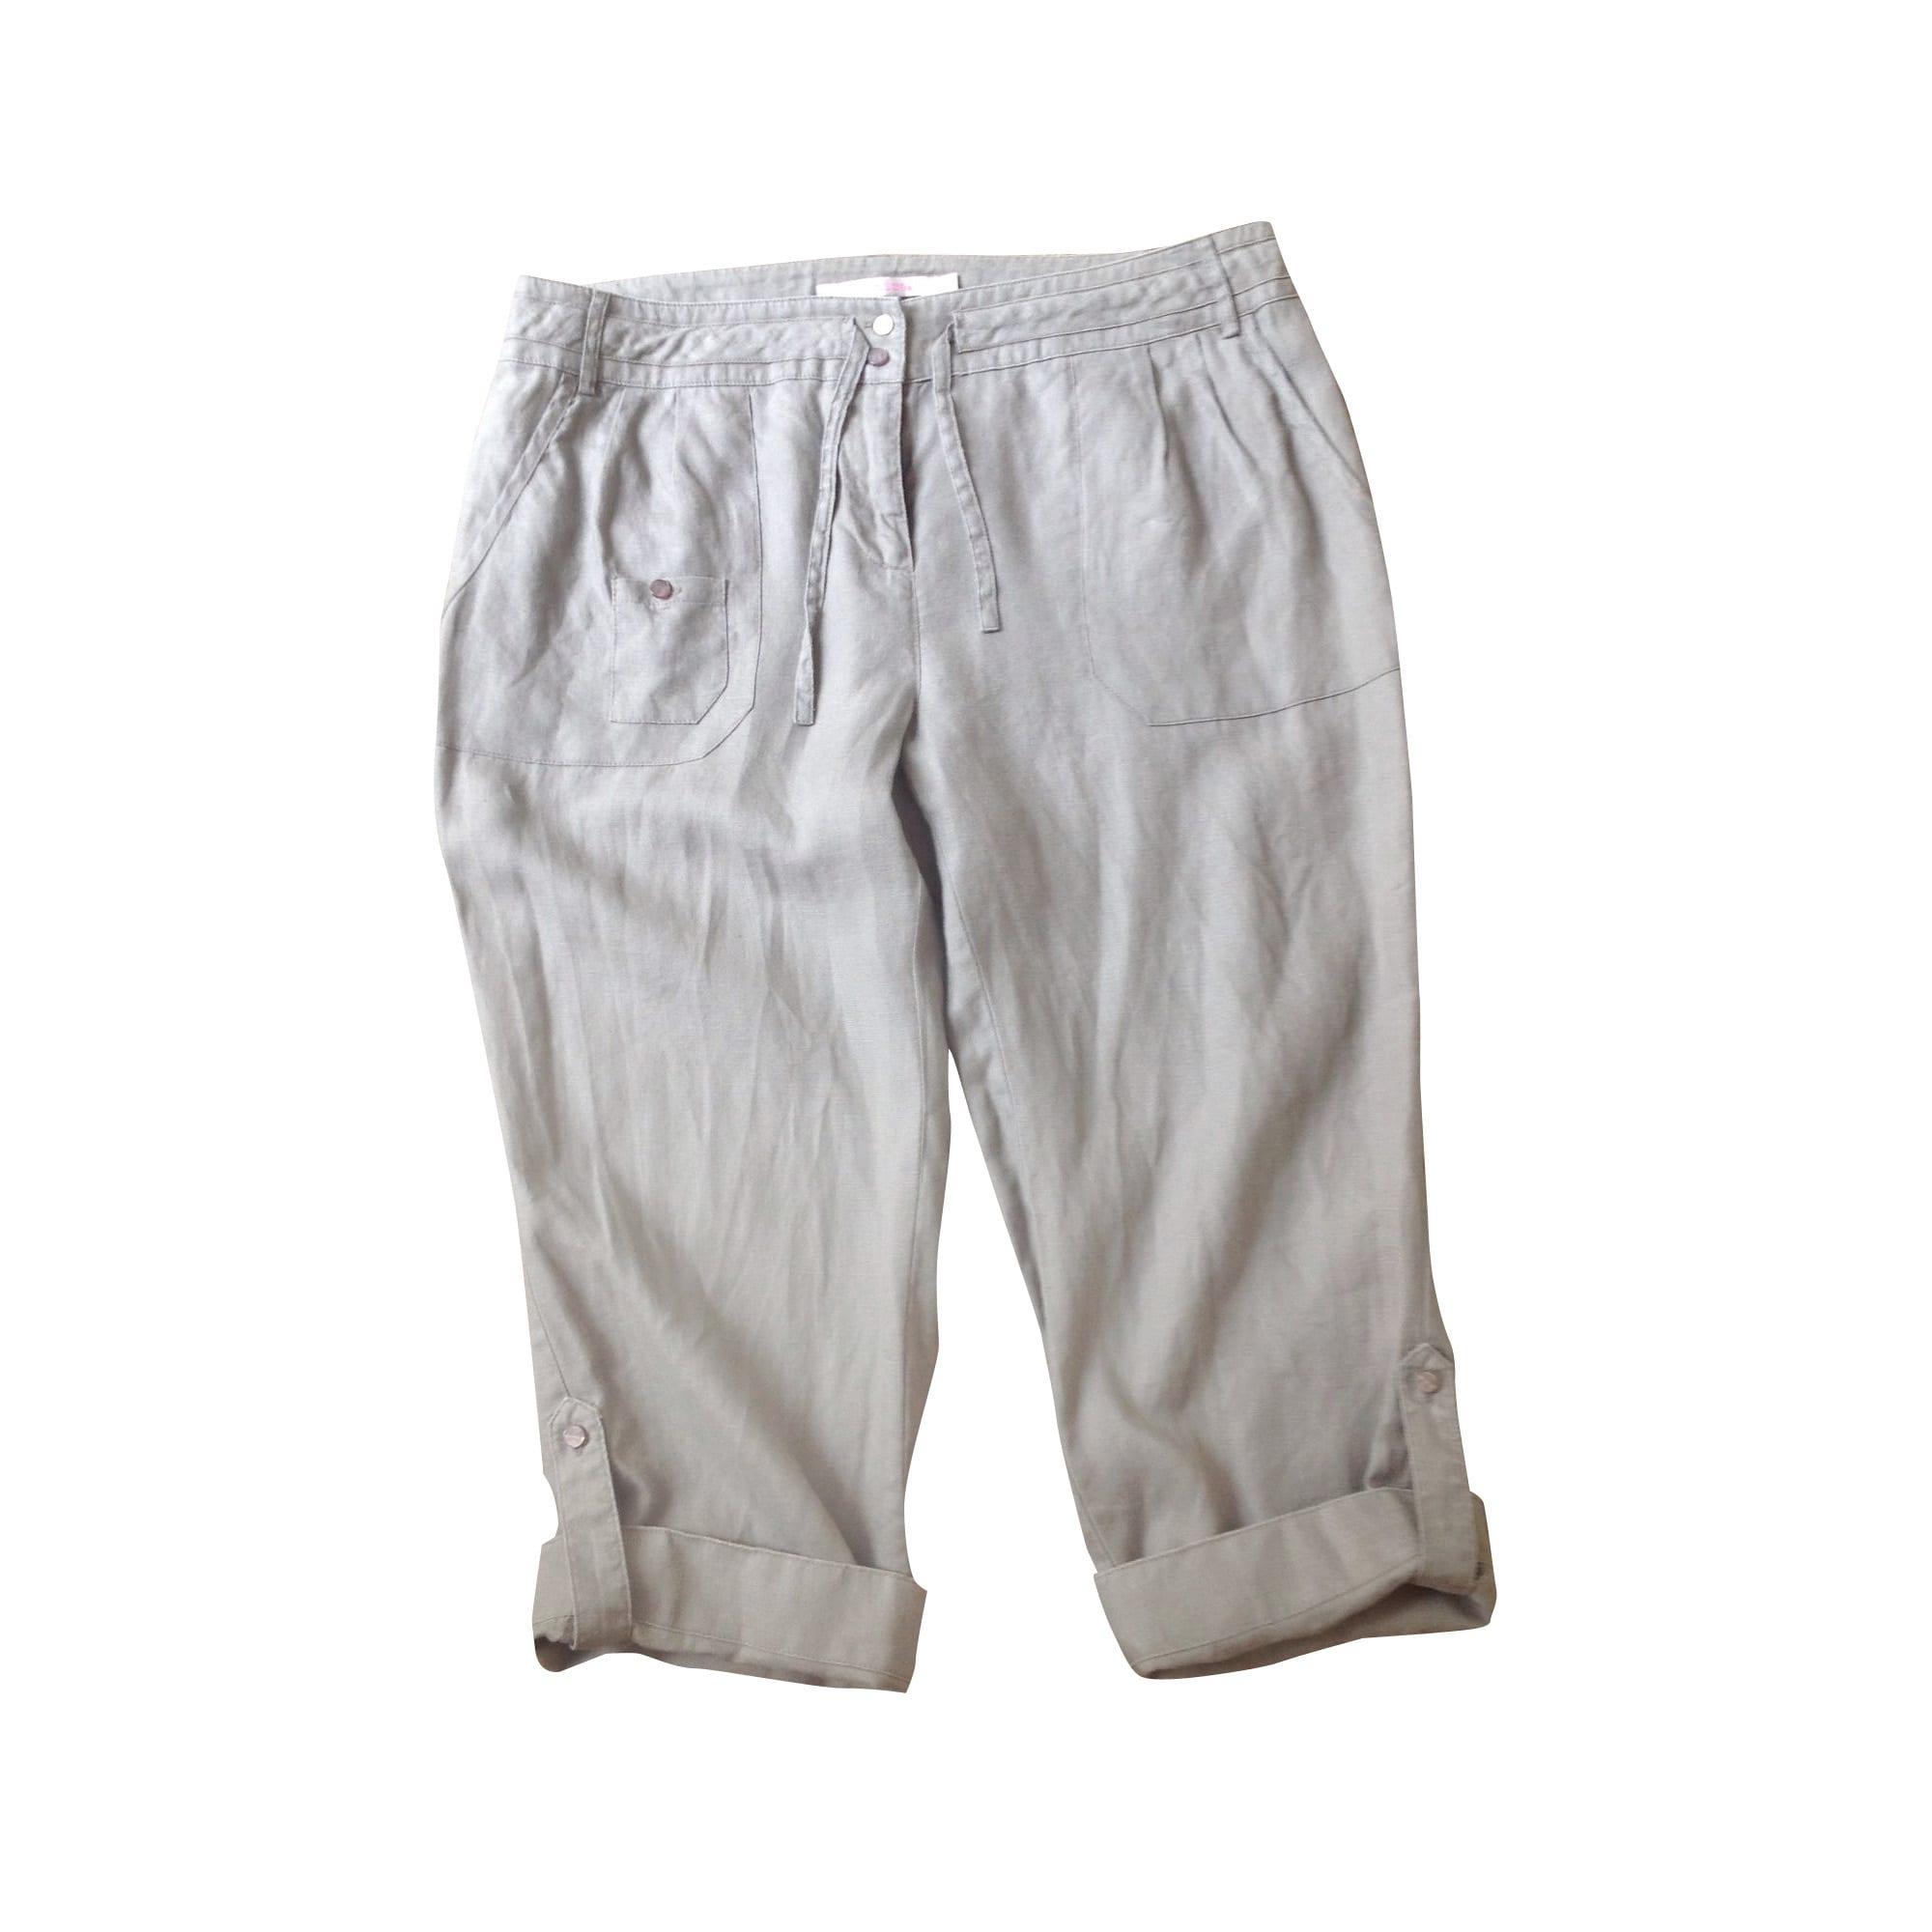 Pantalon droit BERENICE Beige, camel